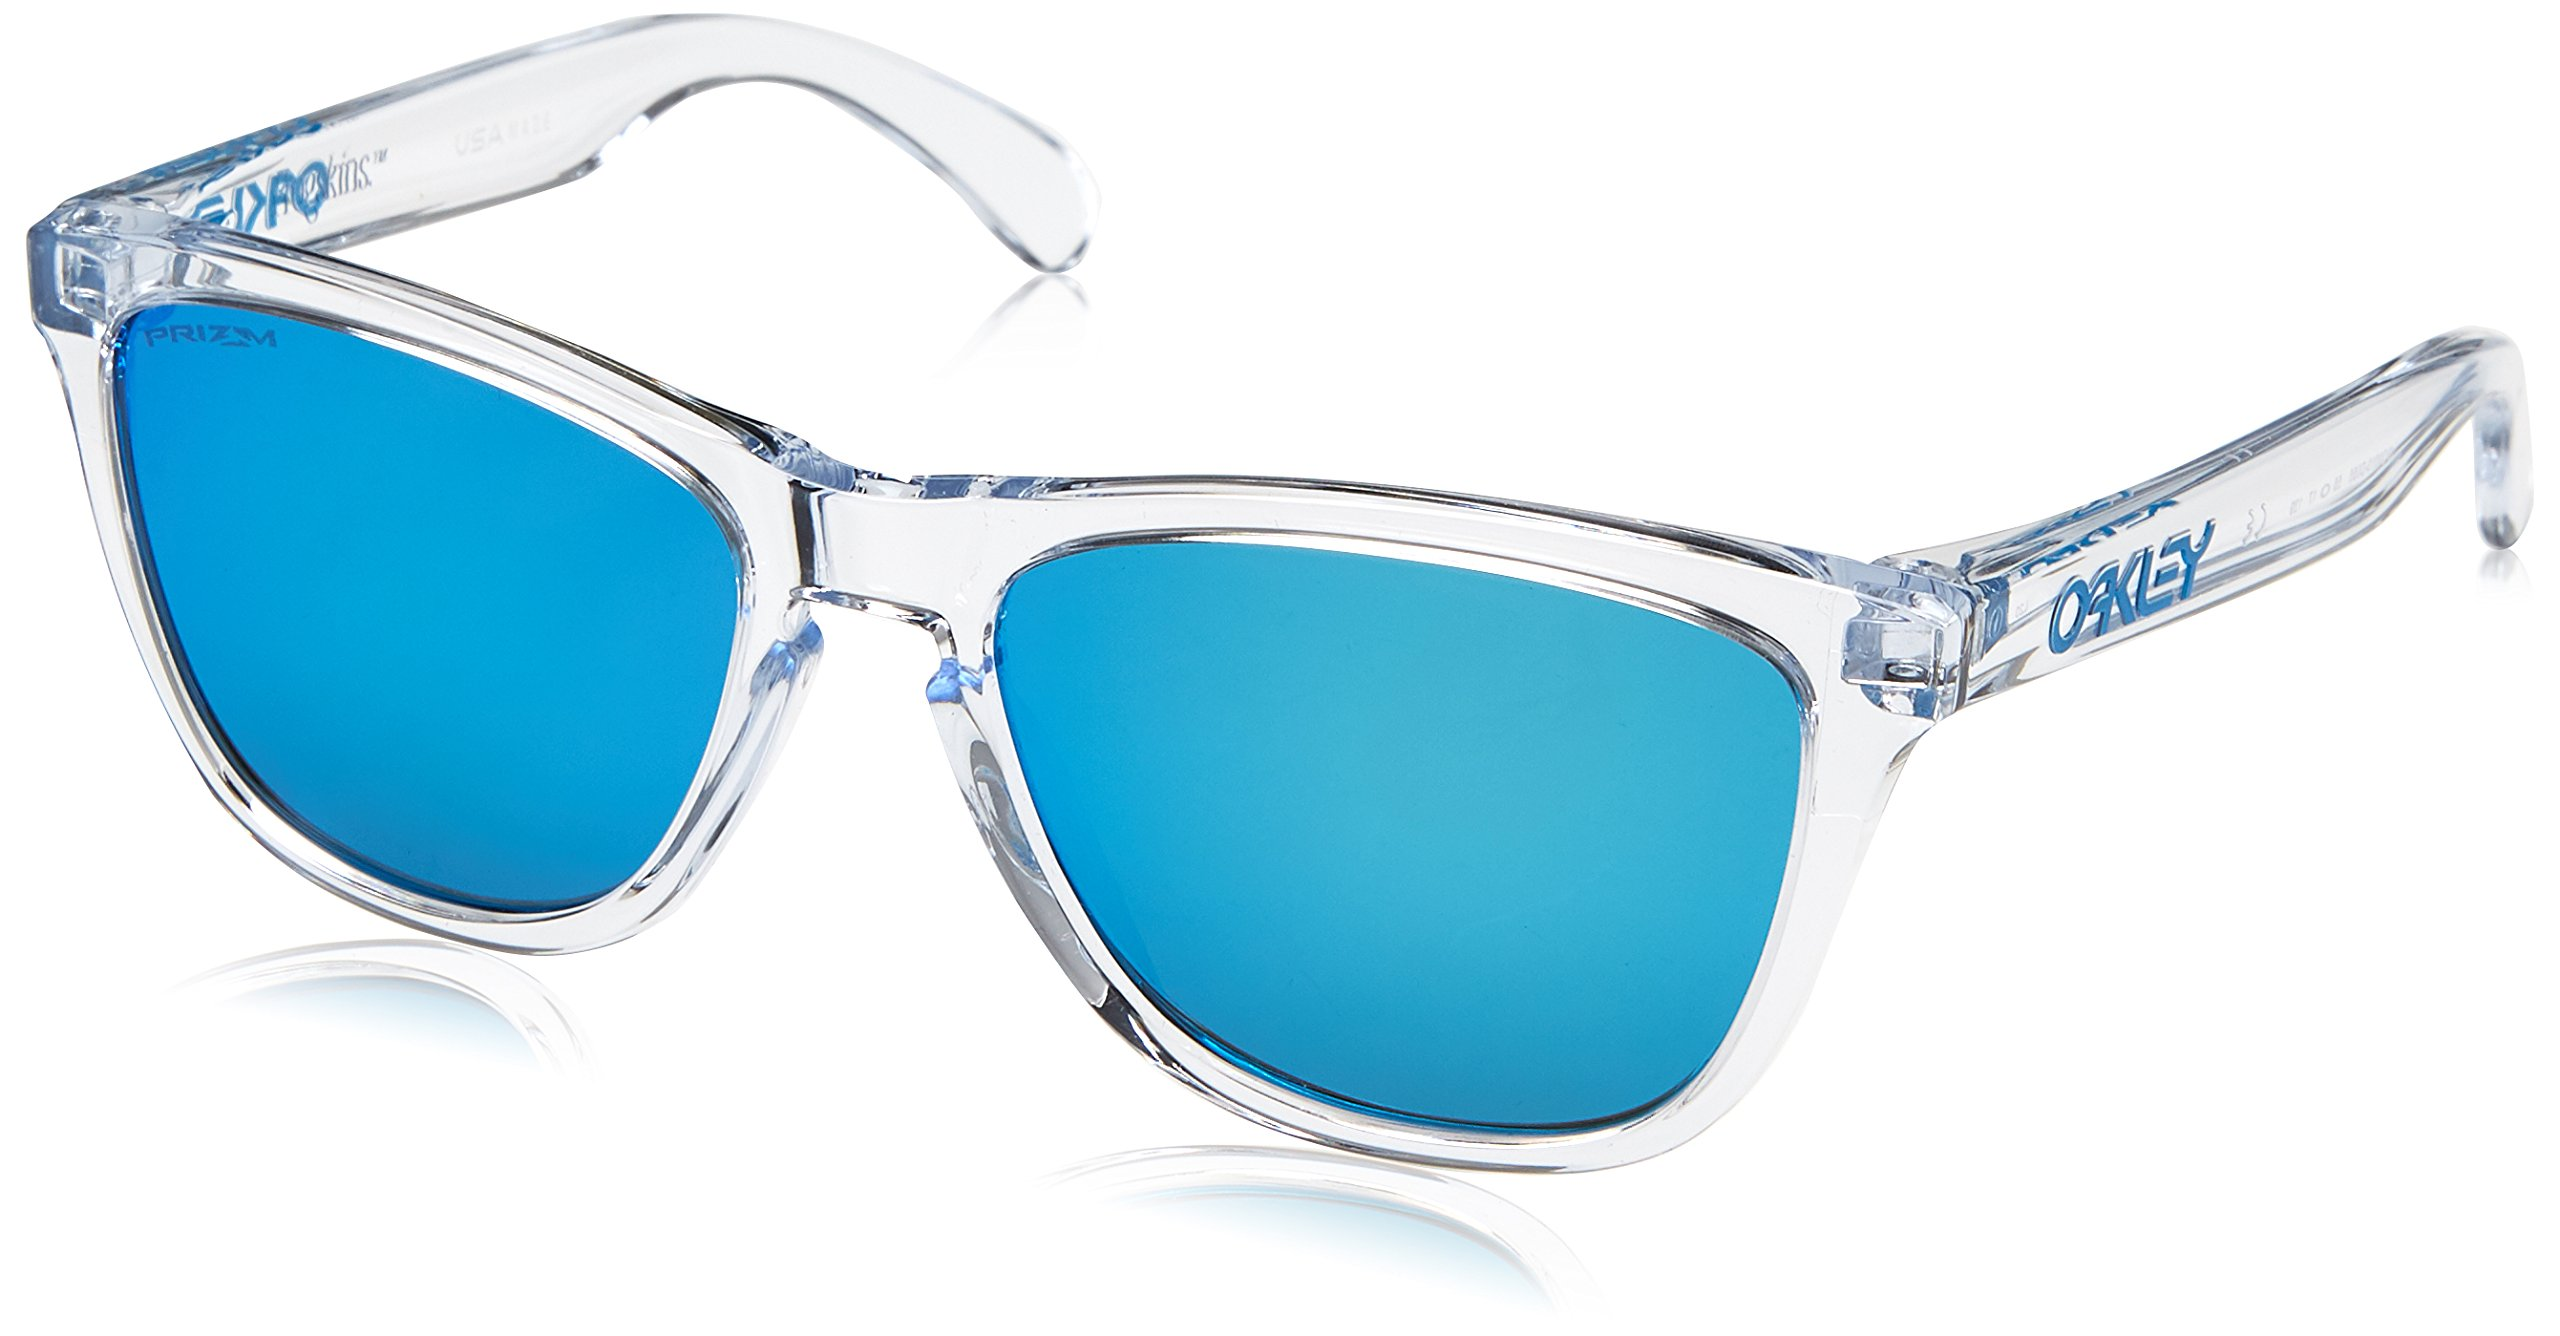 Oakley Men's Frogskins Non-Polarized Iridium Square Sunglasses, Crystal Clear, 54.7 mm